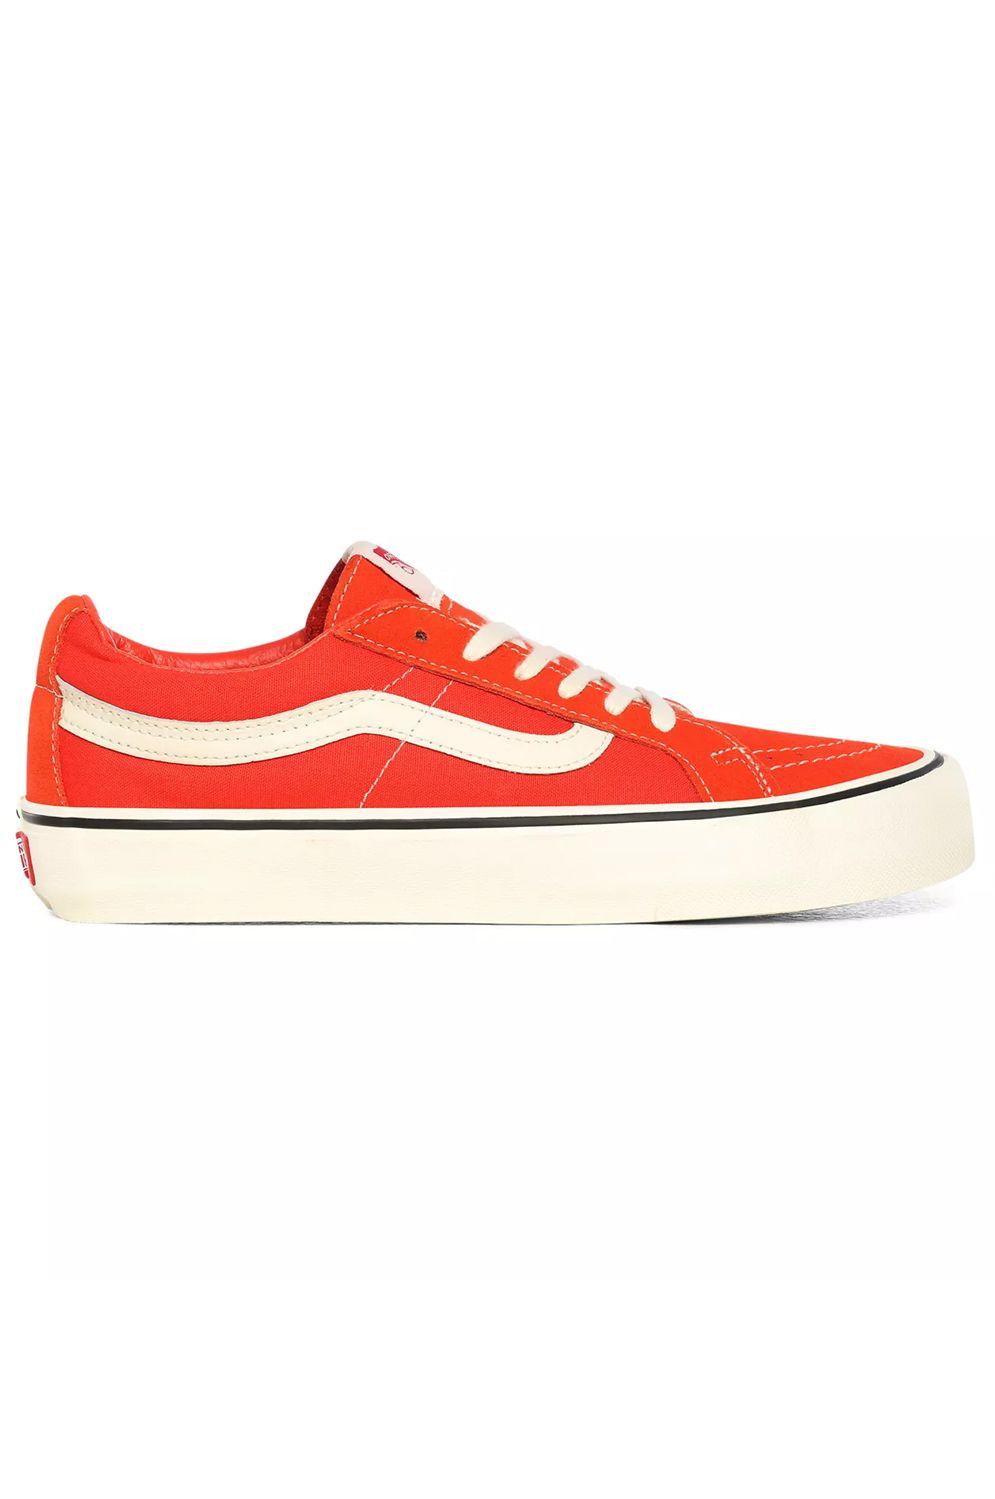 Vans Shoes UA SK8-LOW REISSUE SF Tomato/Antique White